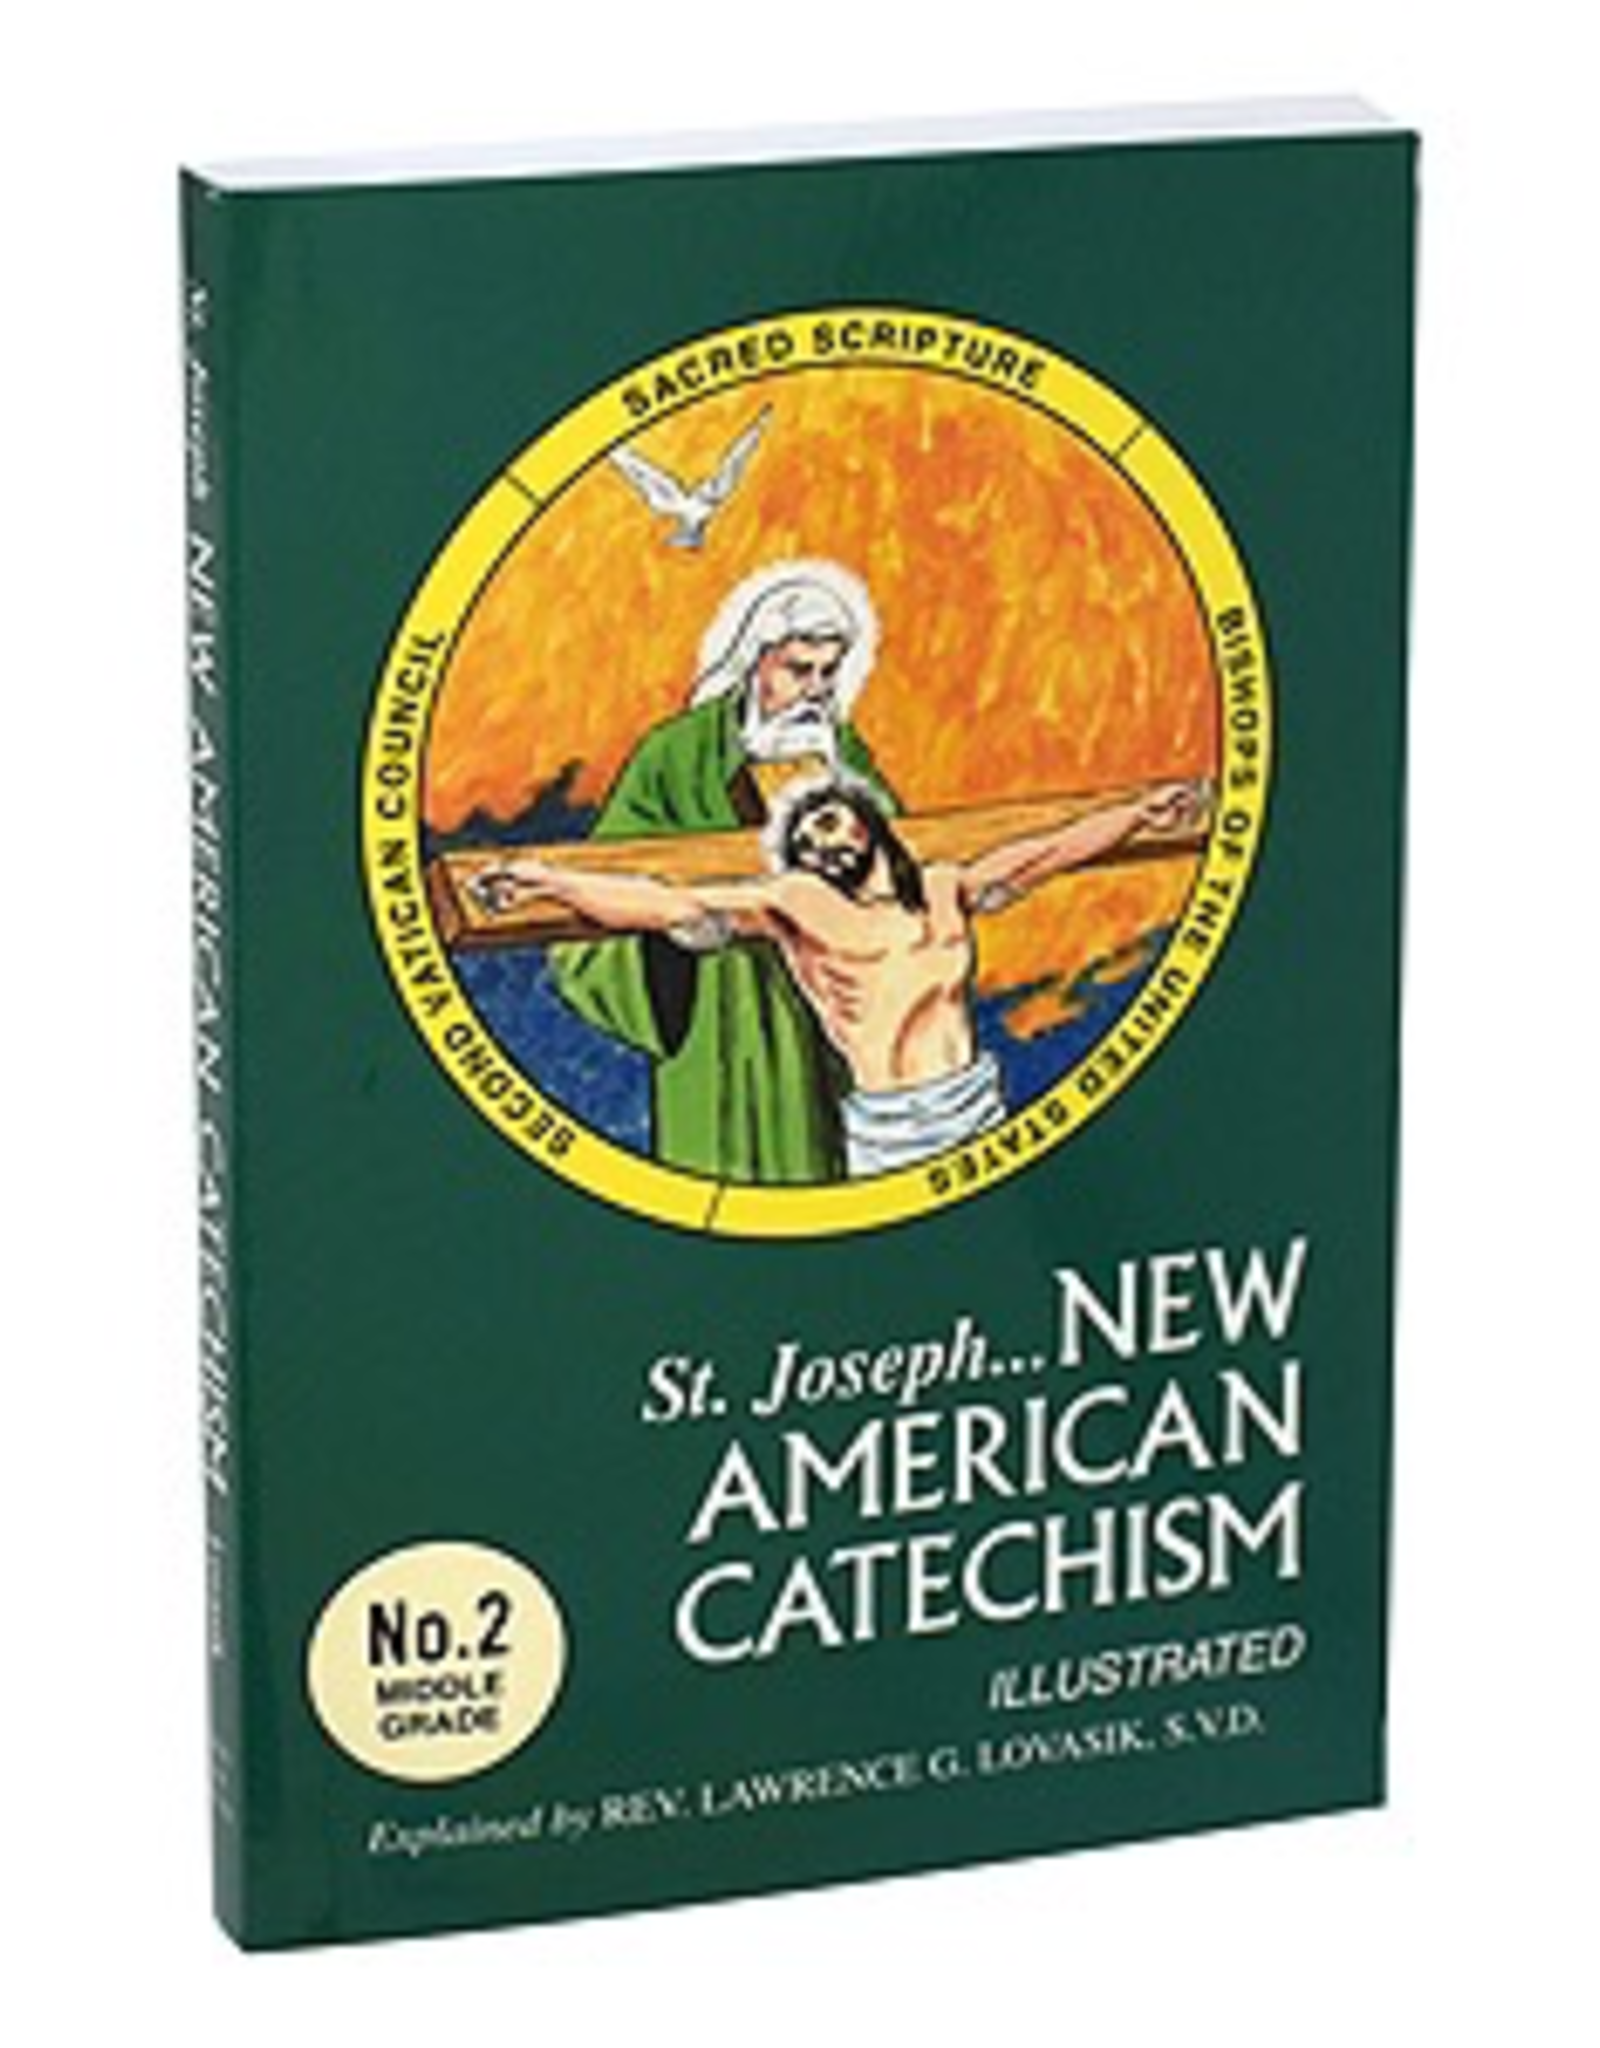 Catholic Book Publishing St, Joseph New American Catechism by Lawence Lovasik (paperback)